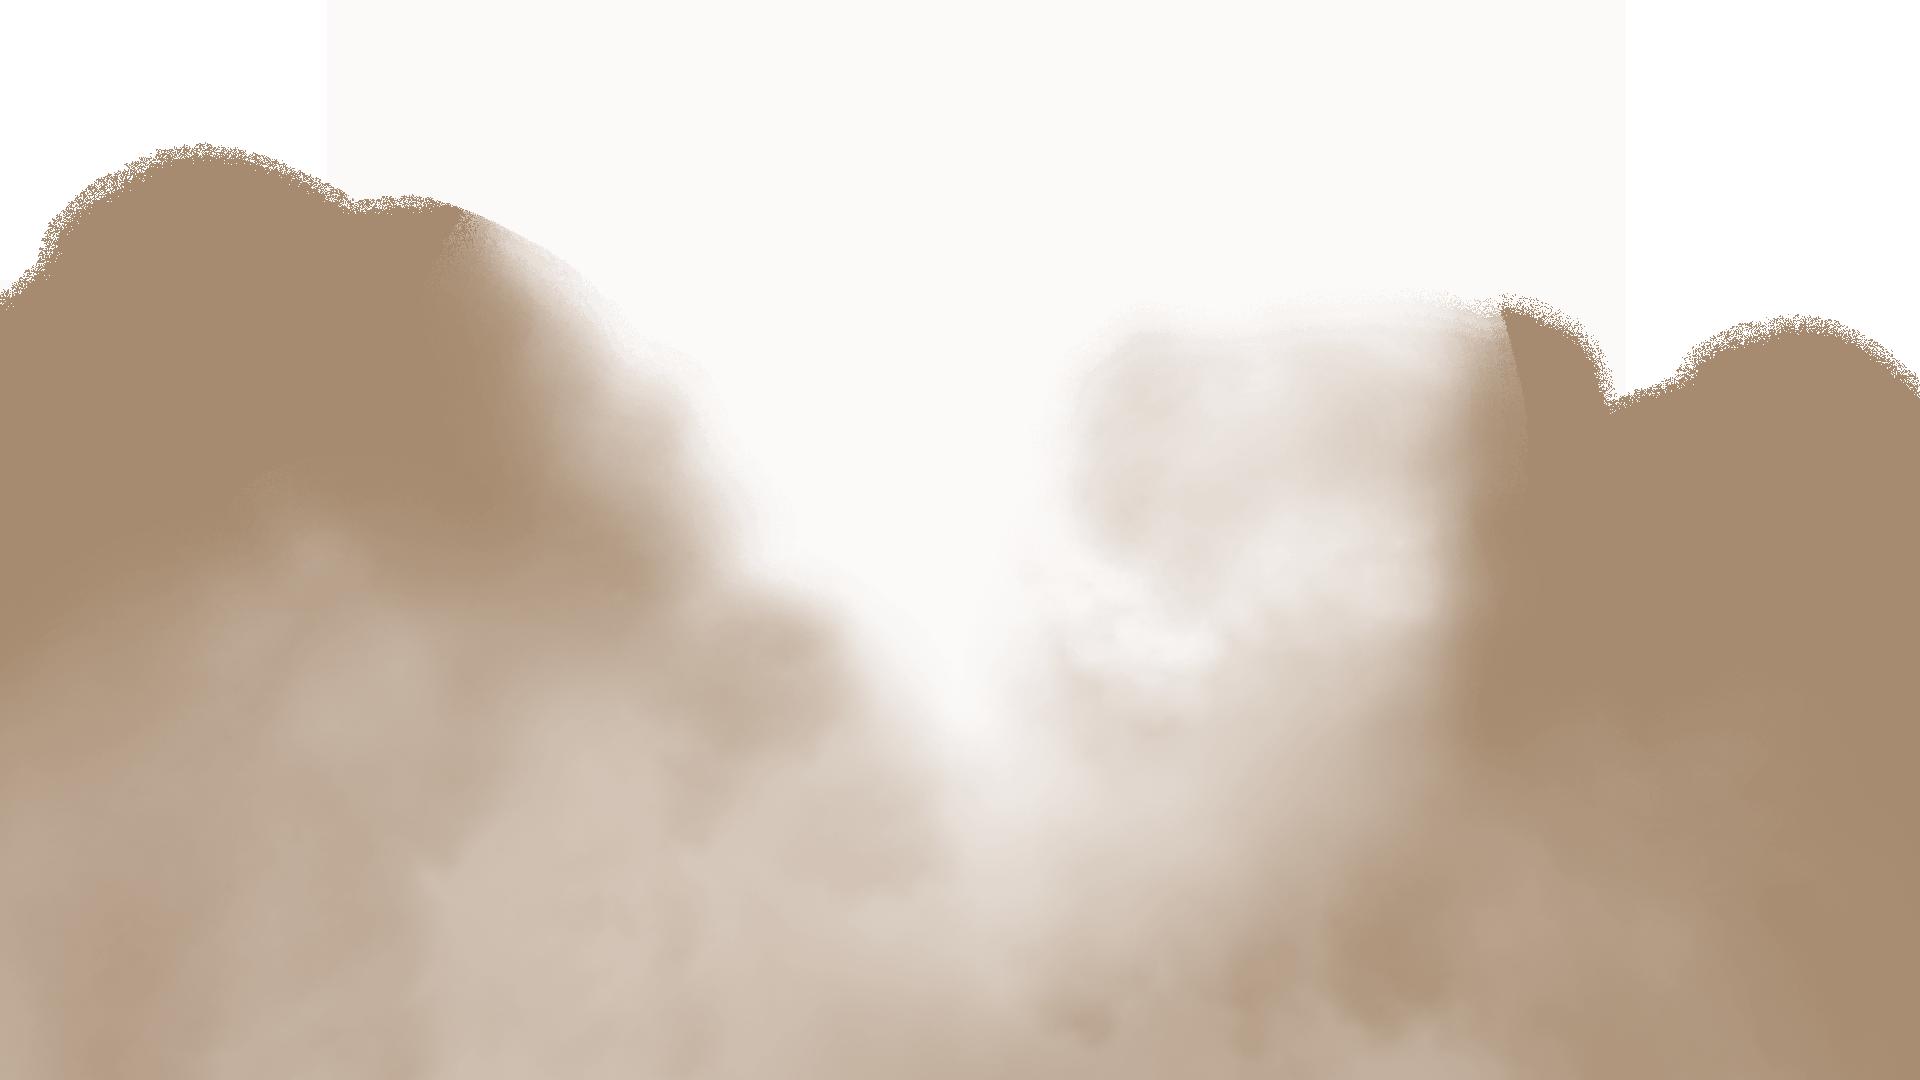 0804_BG_mist.png